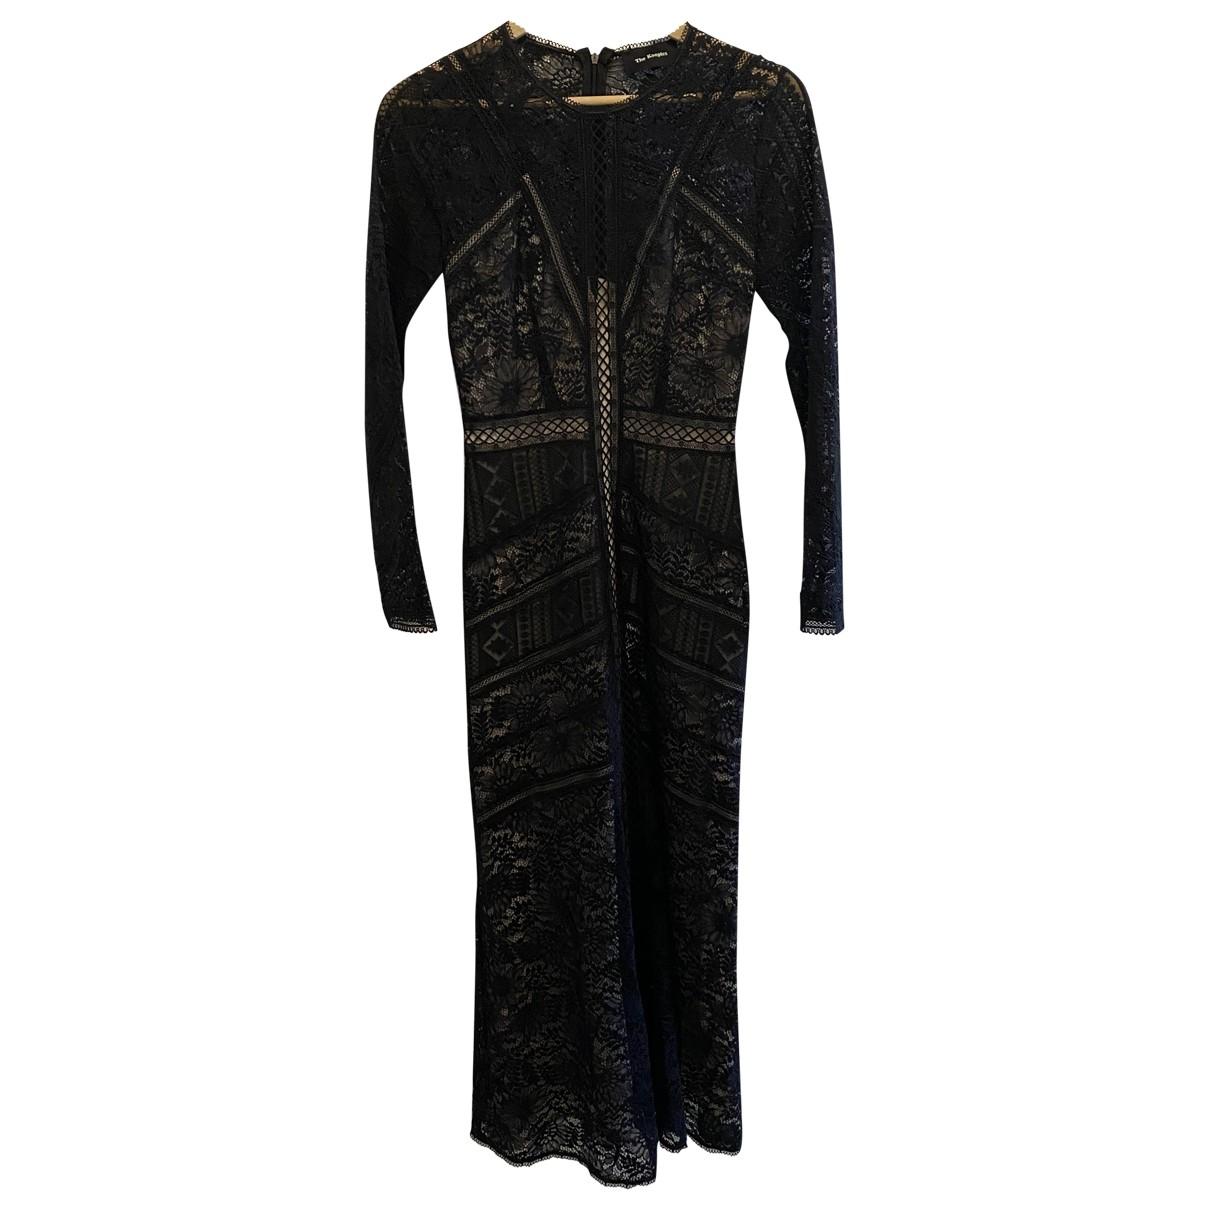 The Kooples \N Navy dress for Women S International